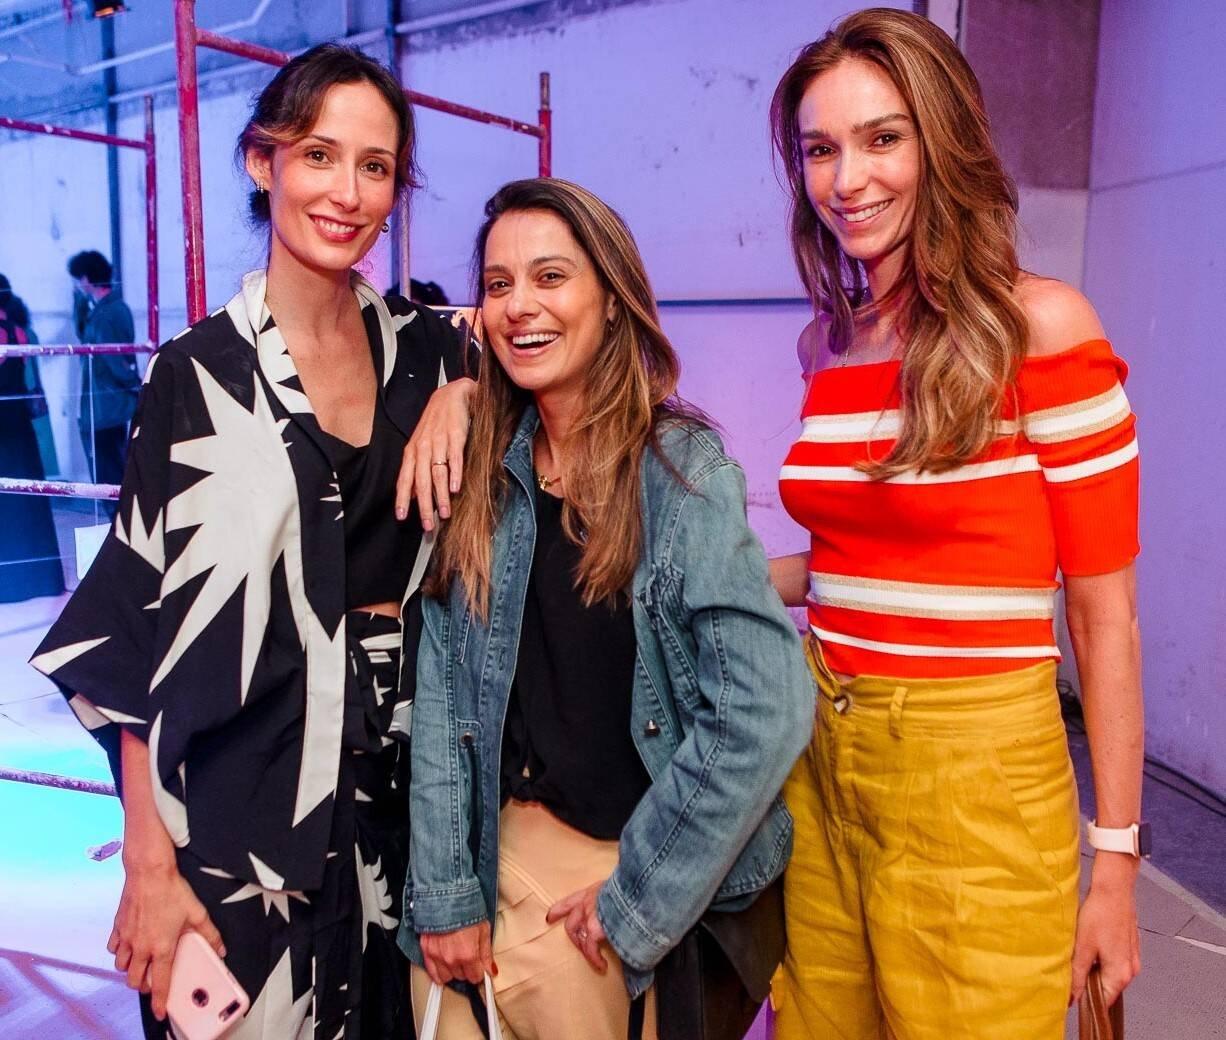 Renata Assunção, Gabrielle Zitelmann e Lilian Pieroni /Foto: Bruno Ryfer